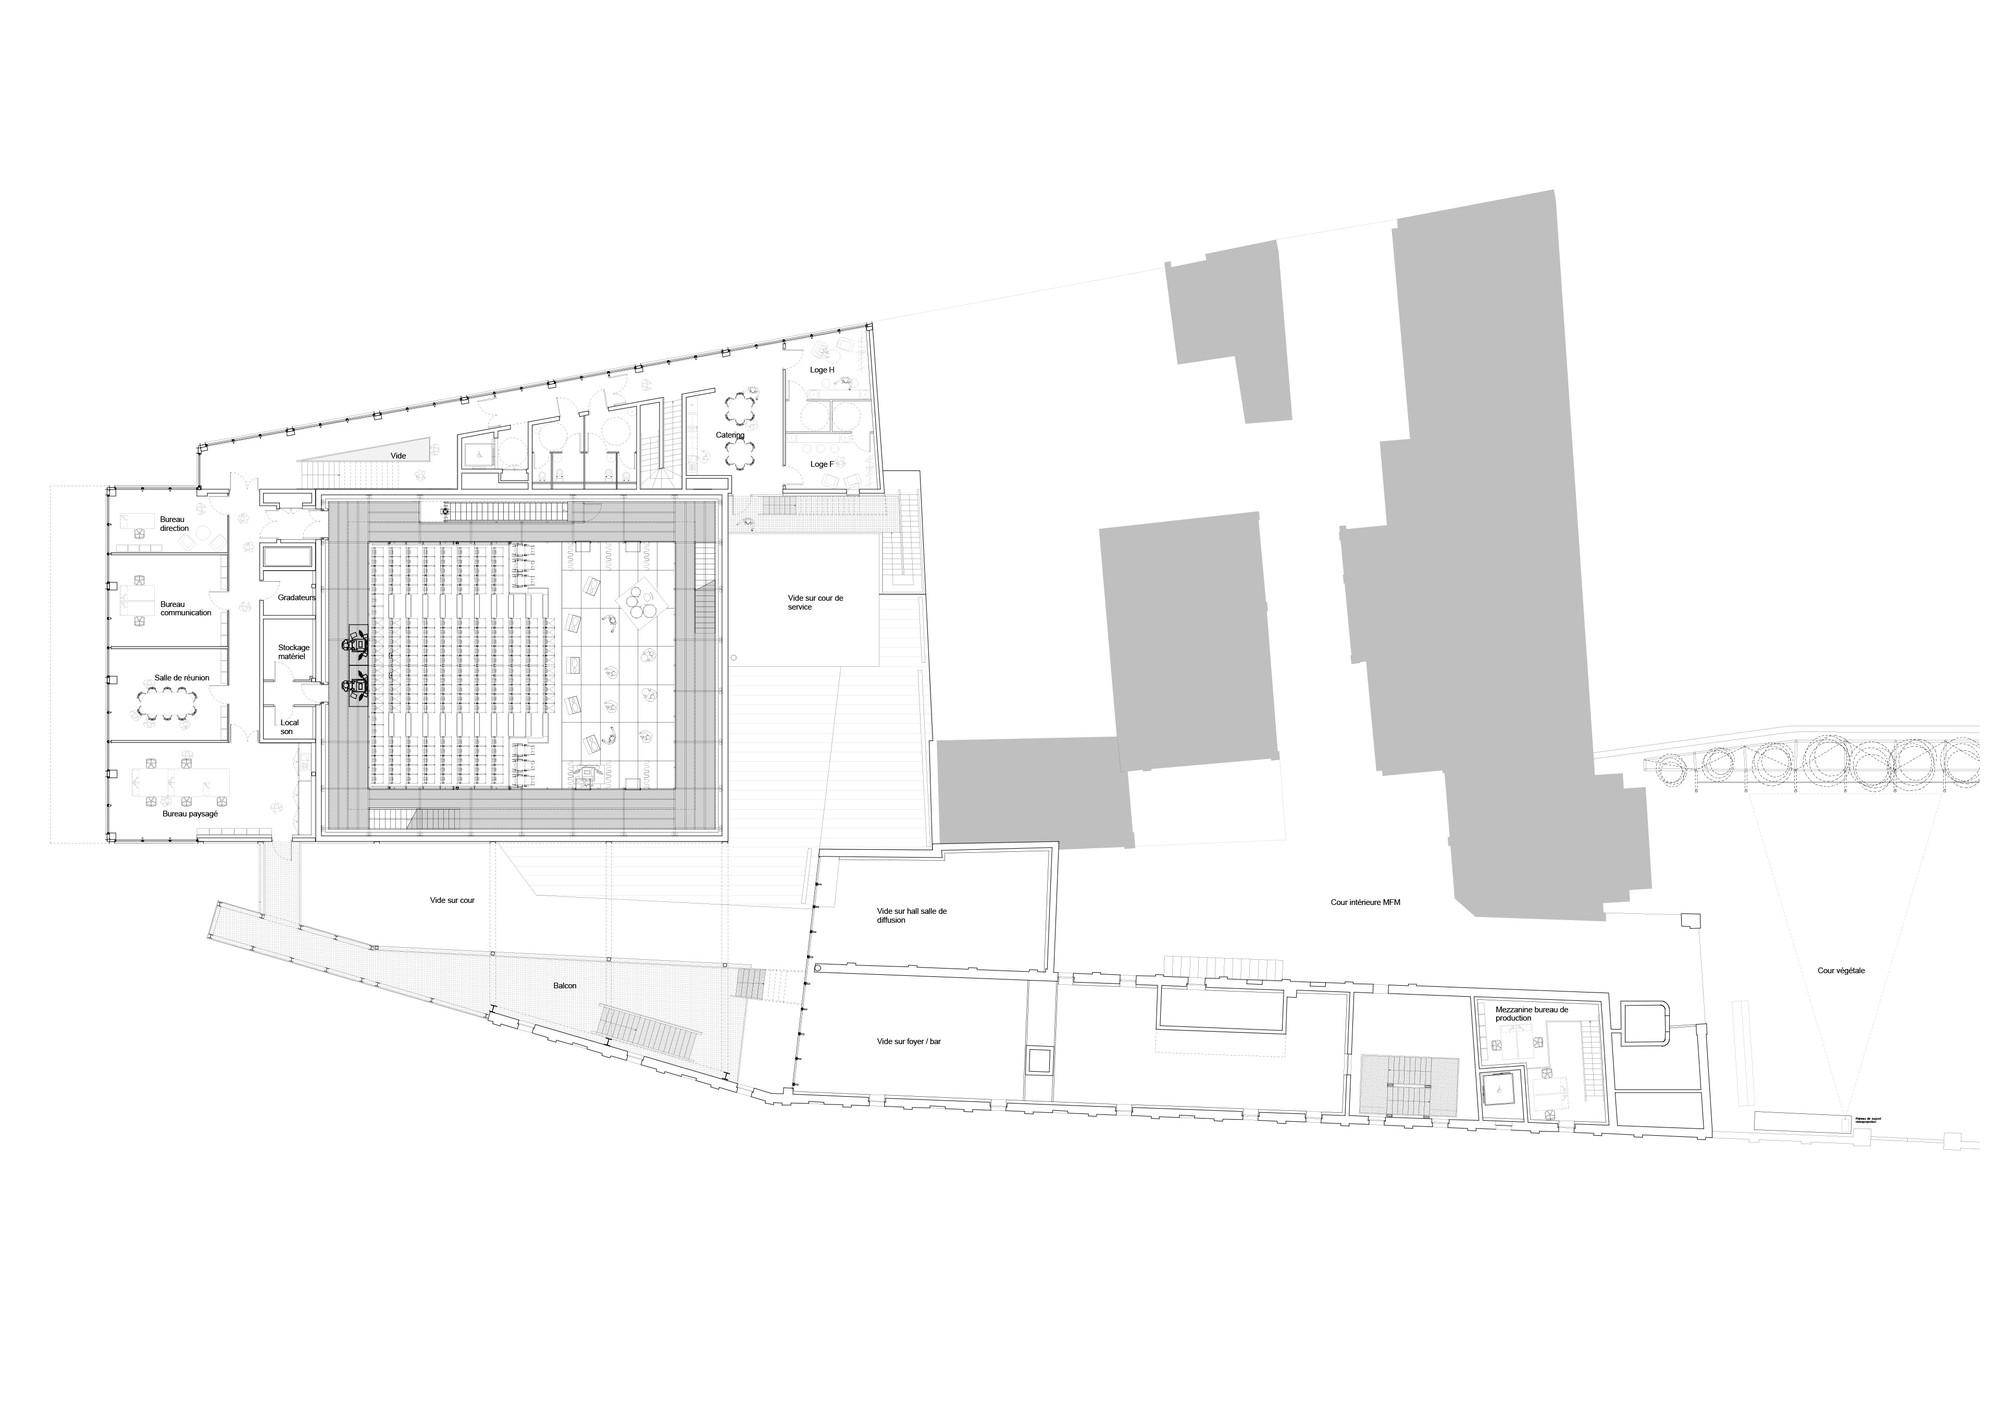 galeria de the flow atelier d architecture king kong 11. Black Bedroom Furniture Sets. Home Design Ideas